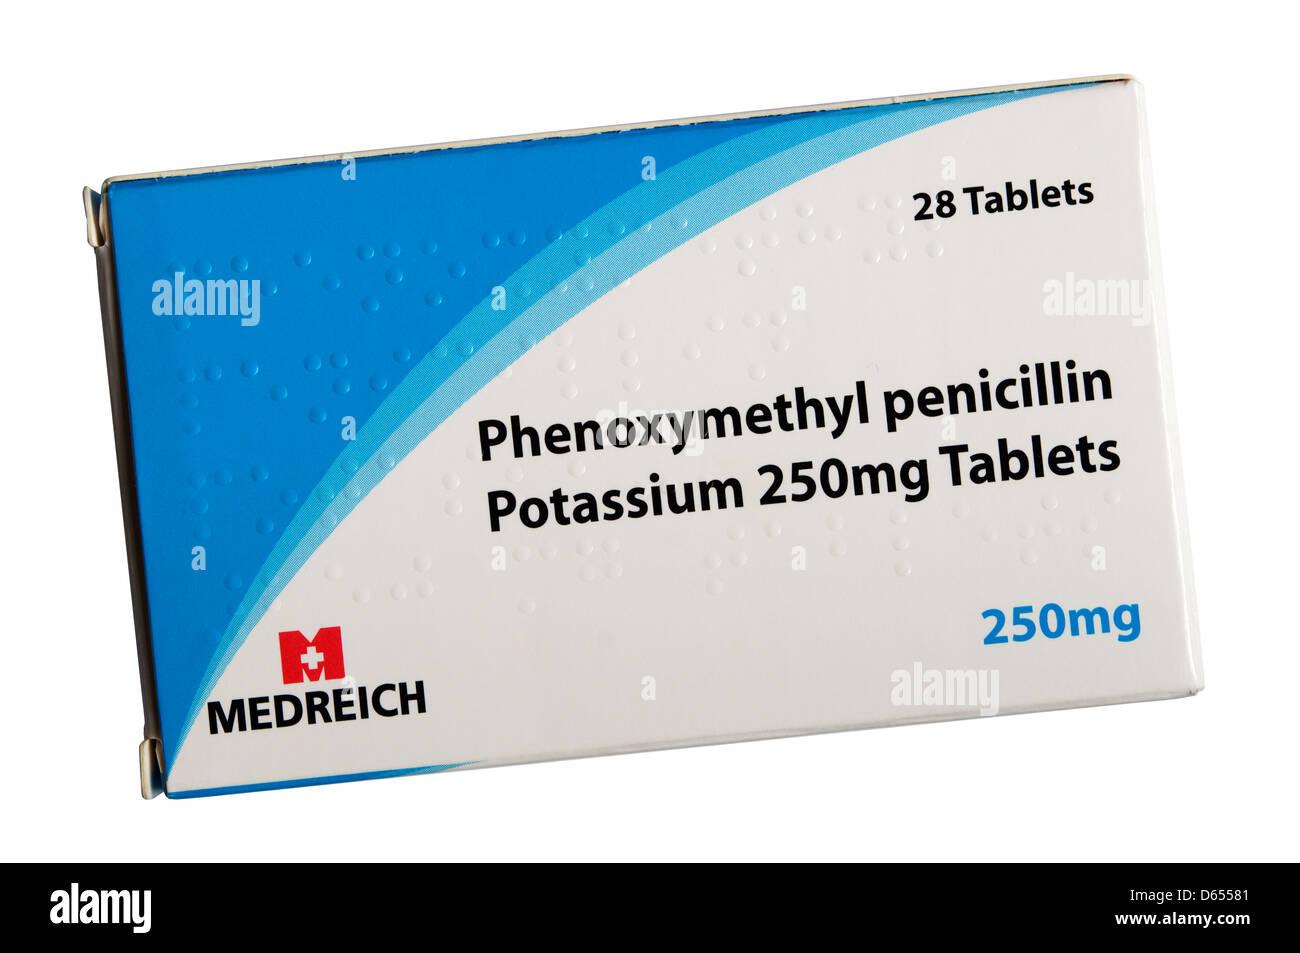 A box of Phenoxymethyl penicillin antibiotics. - Stock Image